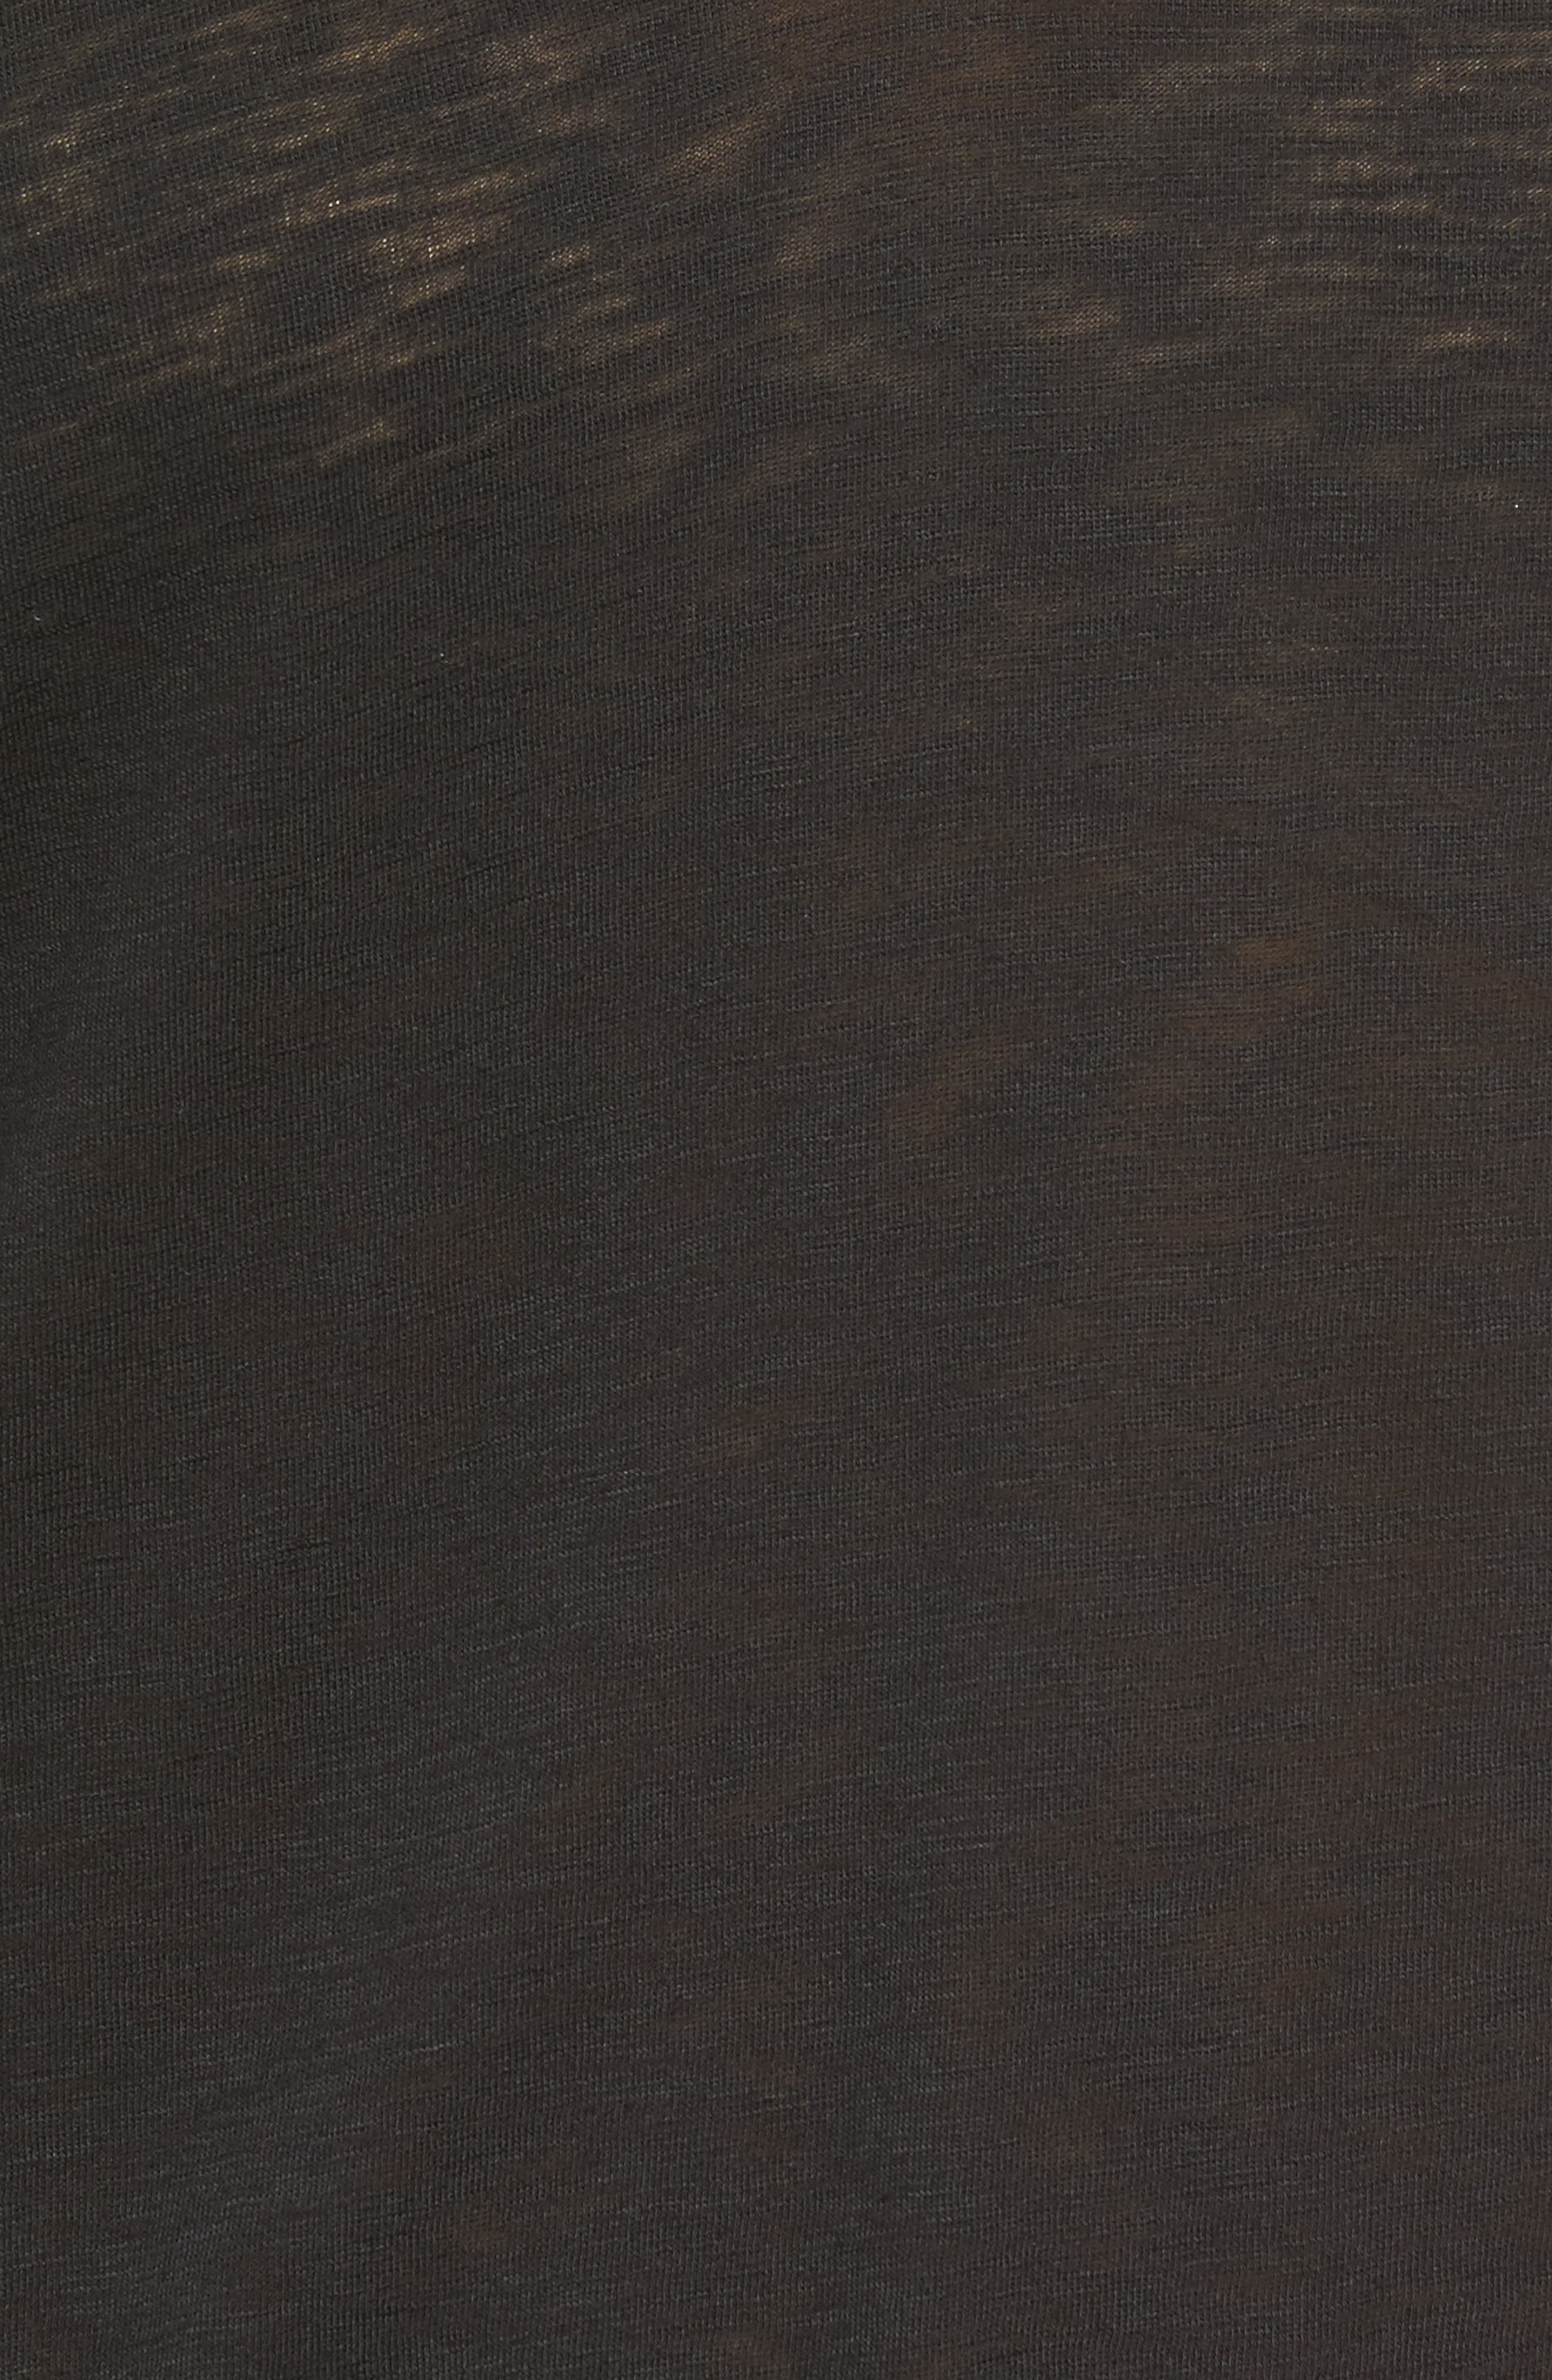 Ruffle Sleeve Tee,                             Alternate thumbnail 5, color,                             001